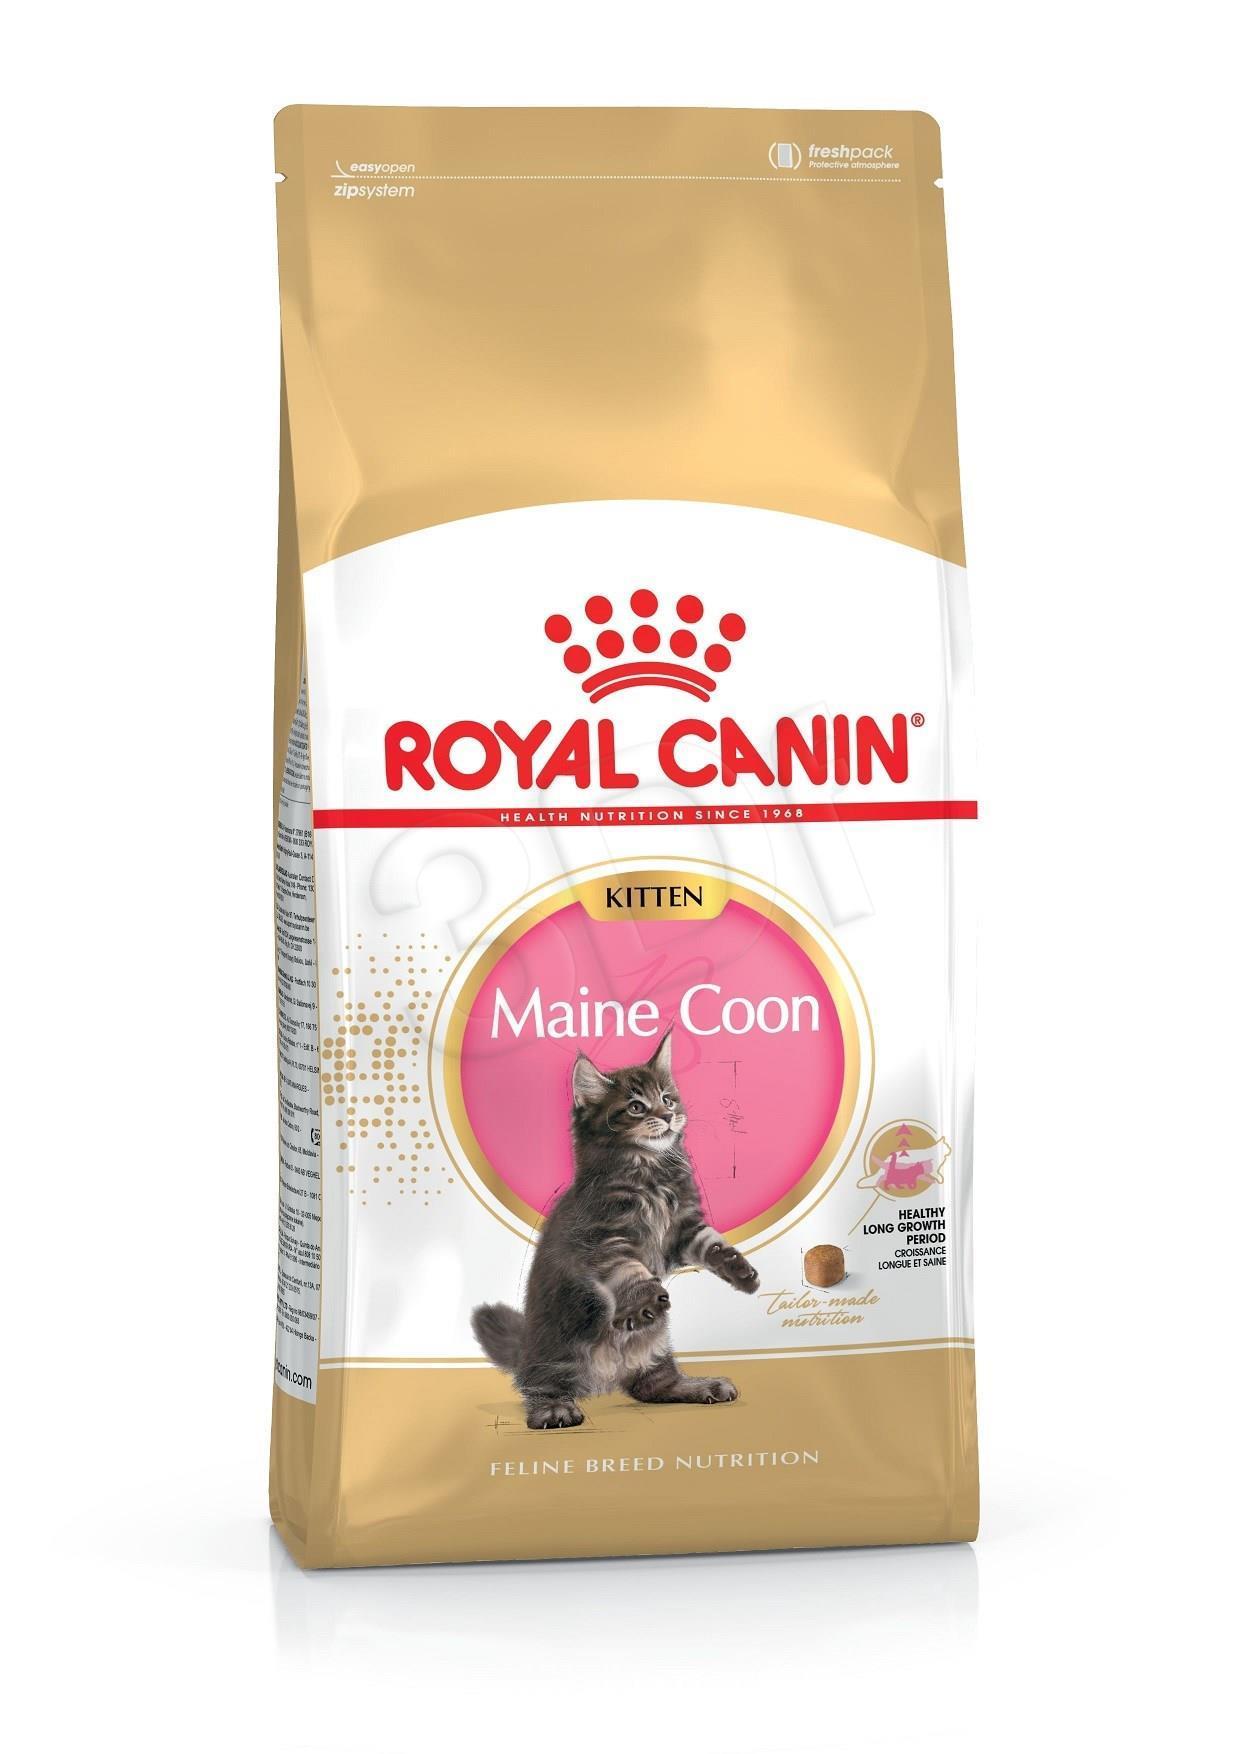 Royal Canin Kitten Food Maine Coon 36 Dry Mix 10kg kaķu barība